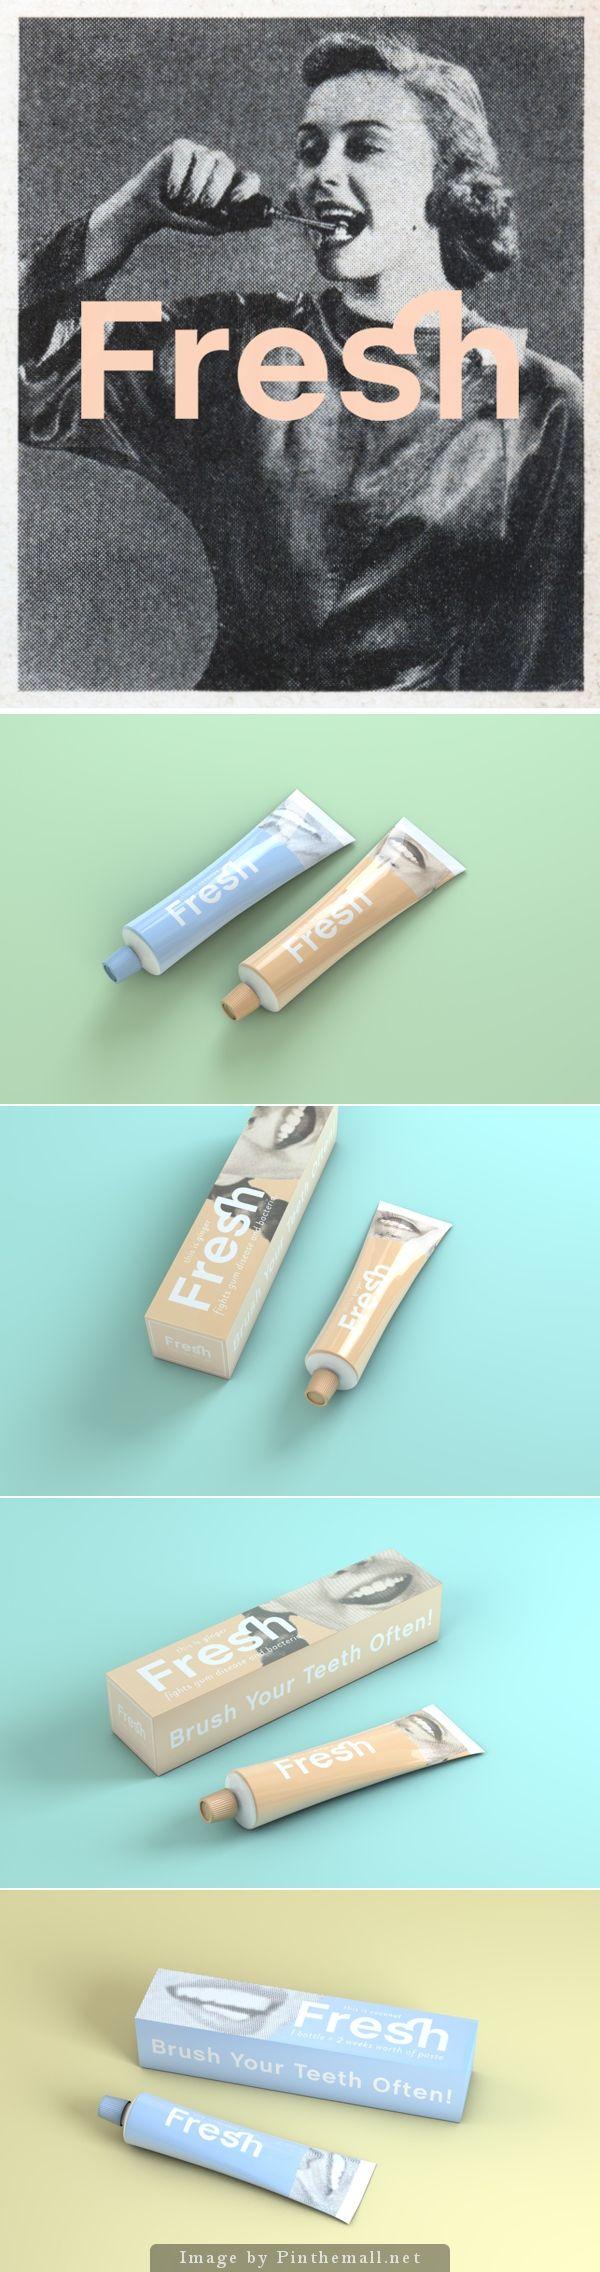 Fresh Toothpaste